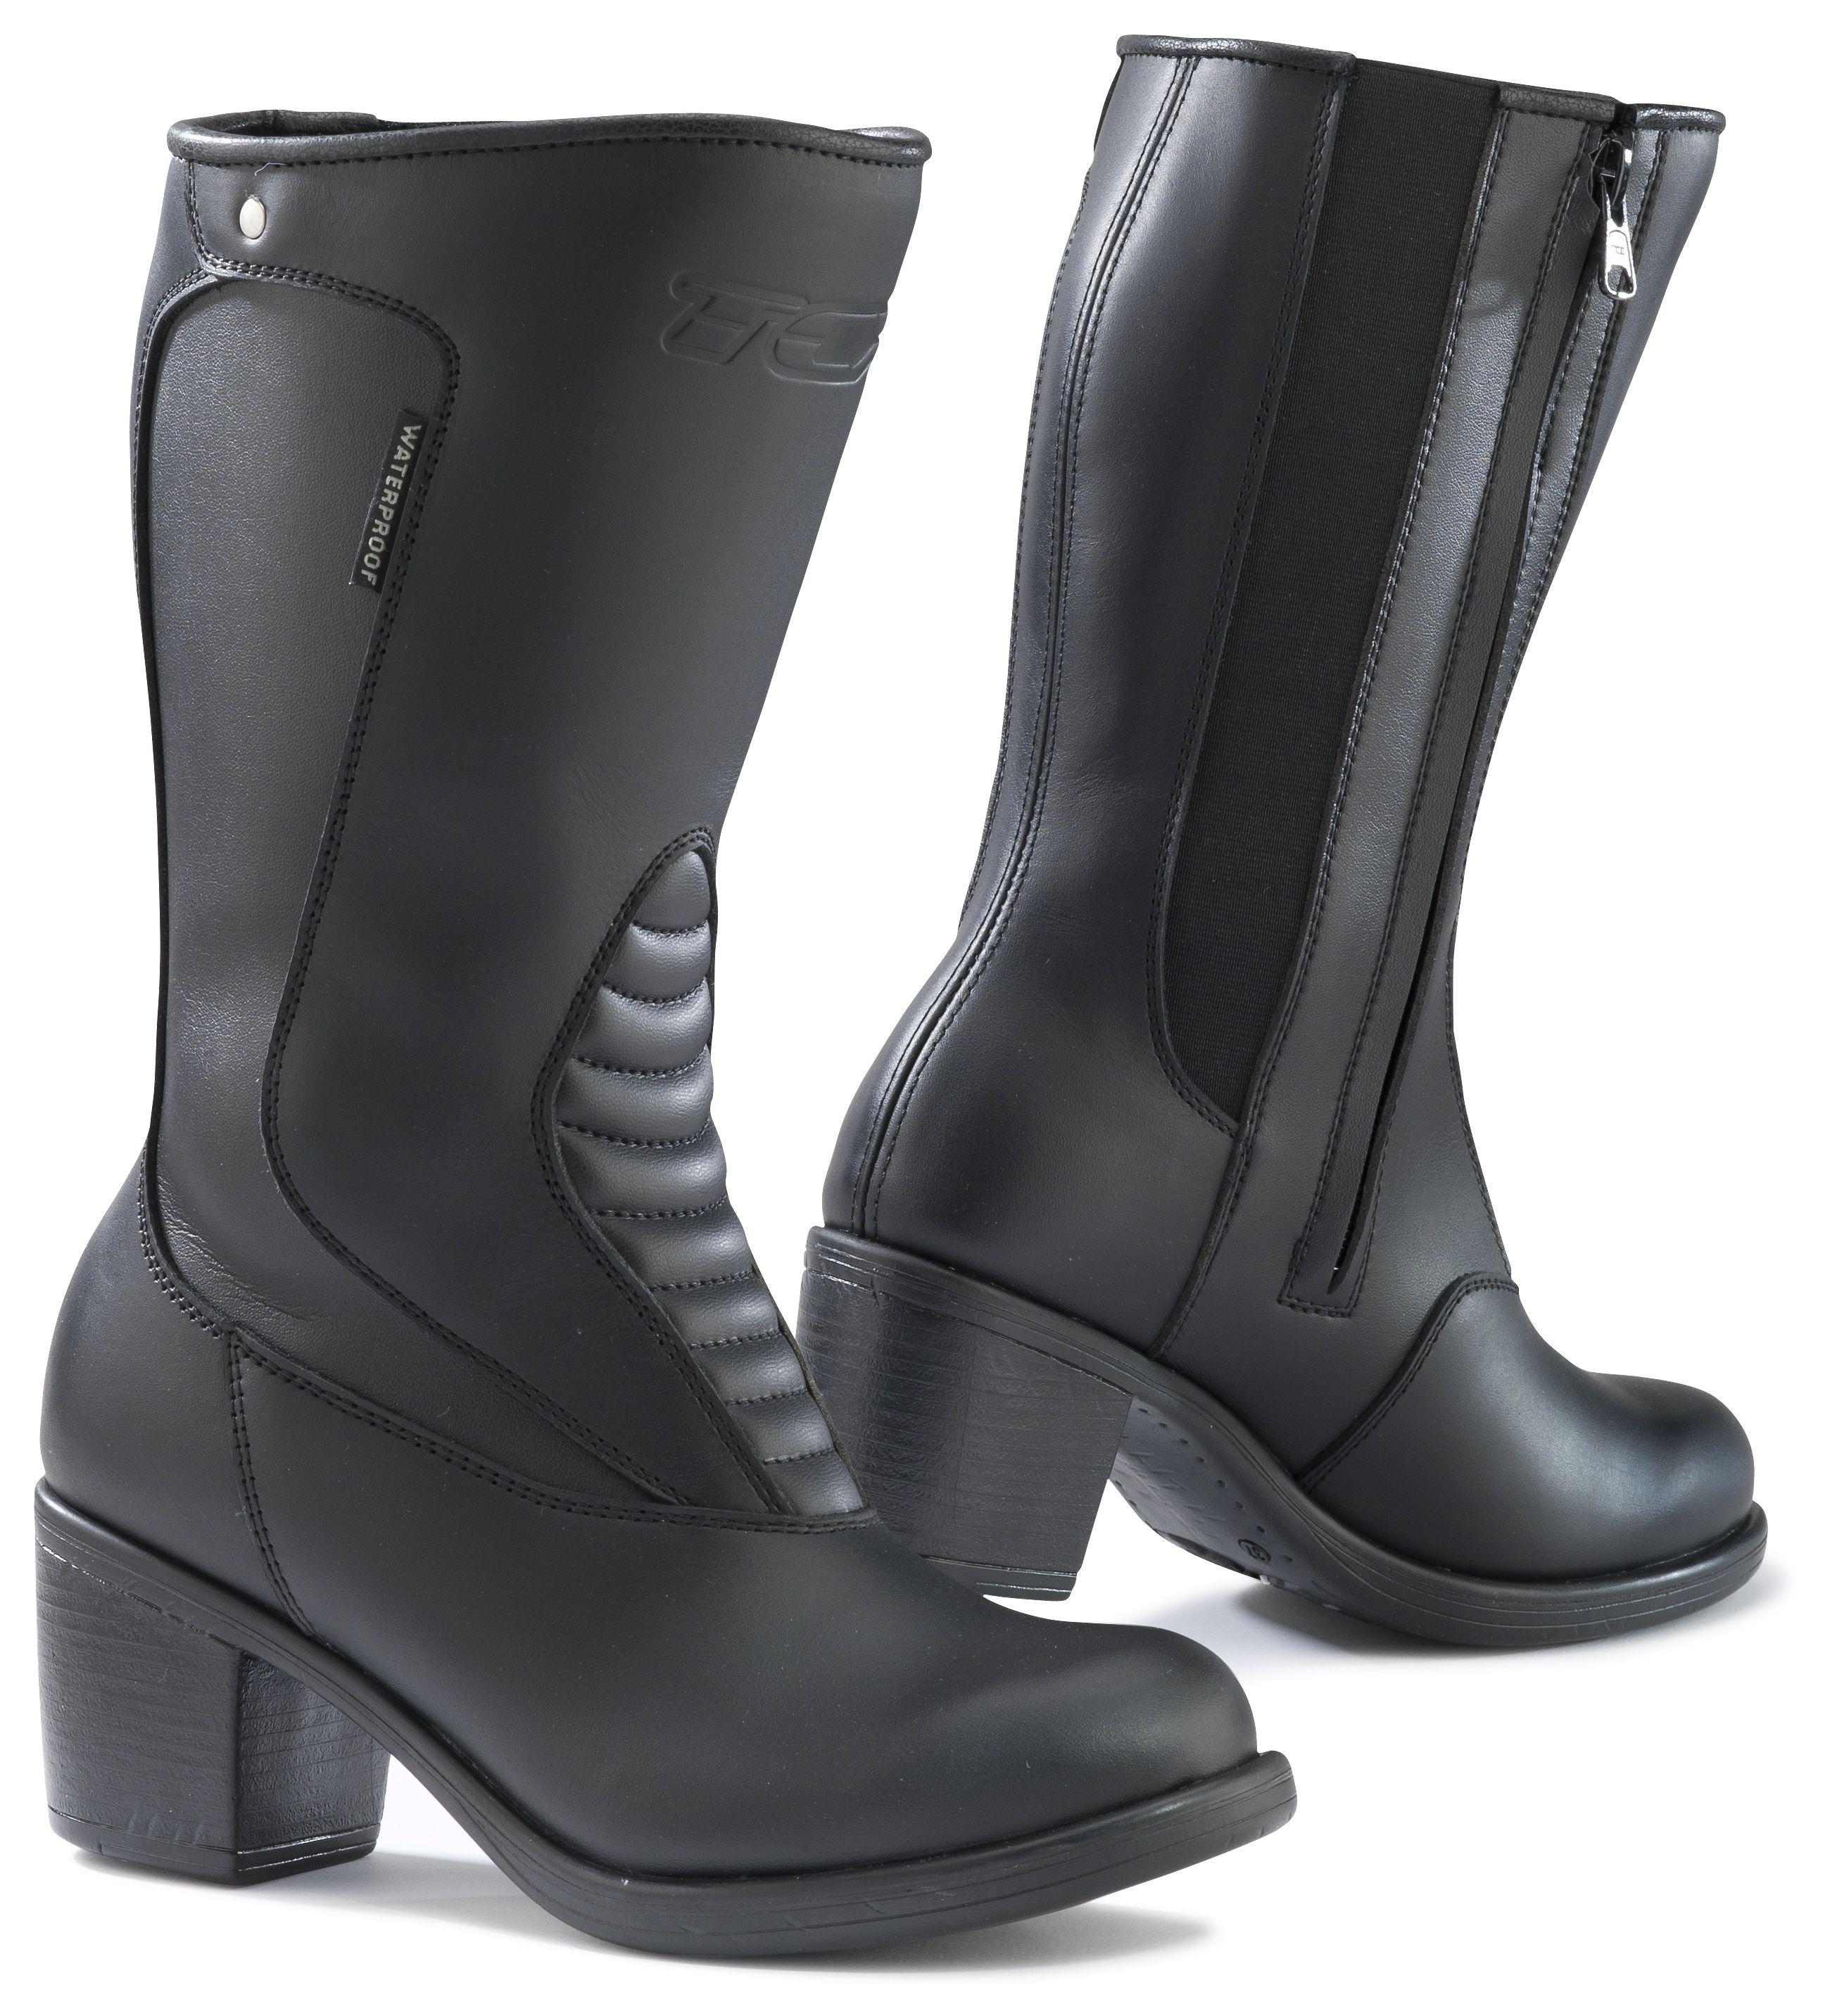 TCX Lady Classic WP Boots - RevZilla